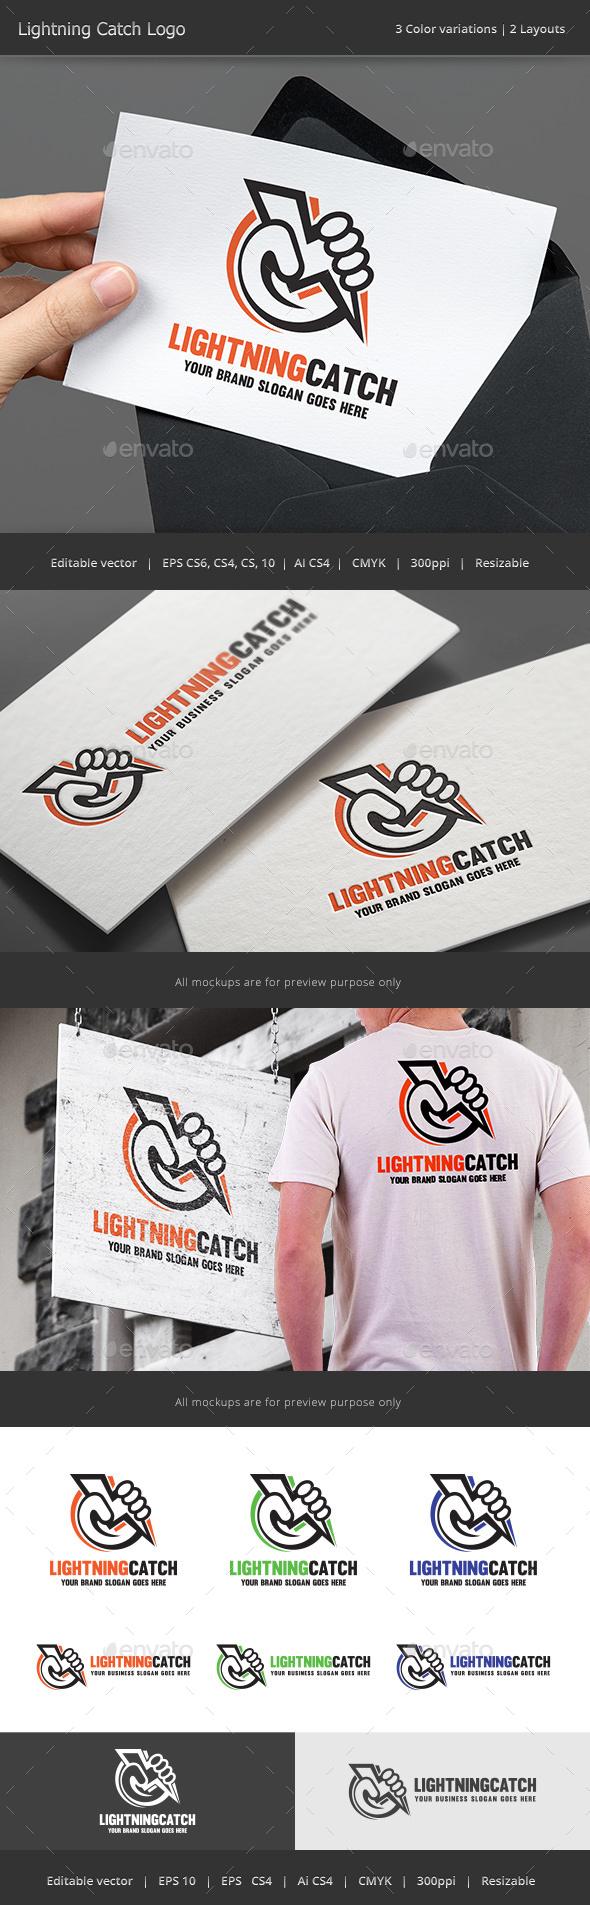 Lightning Catch Logo - Vector Abstract